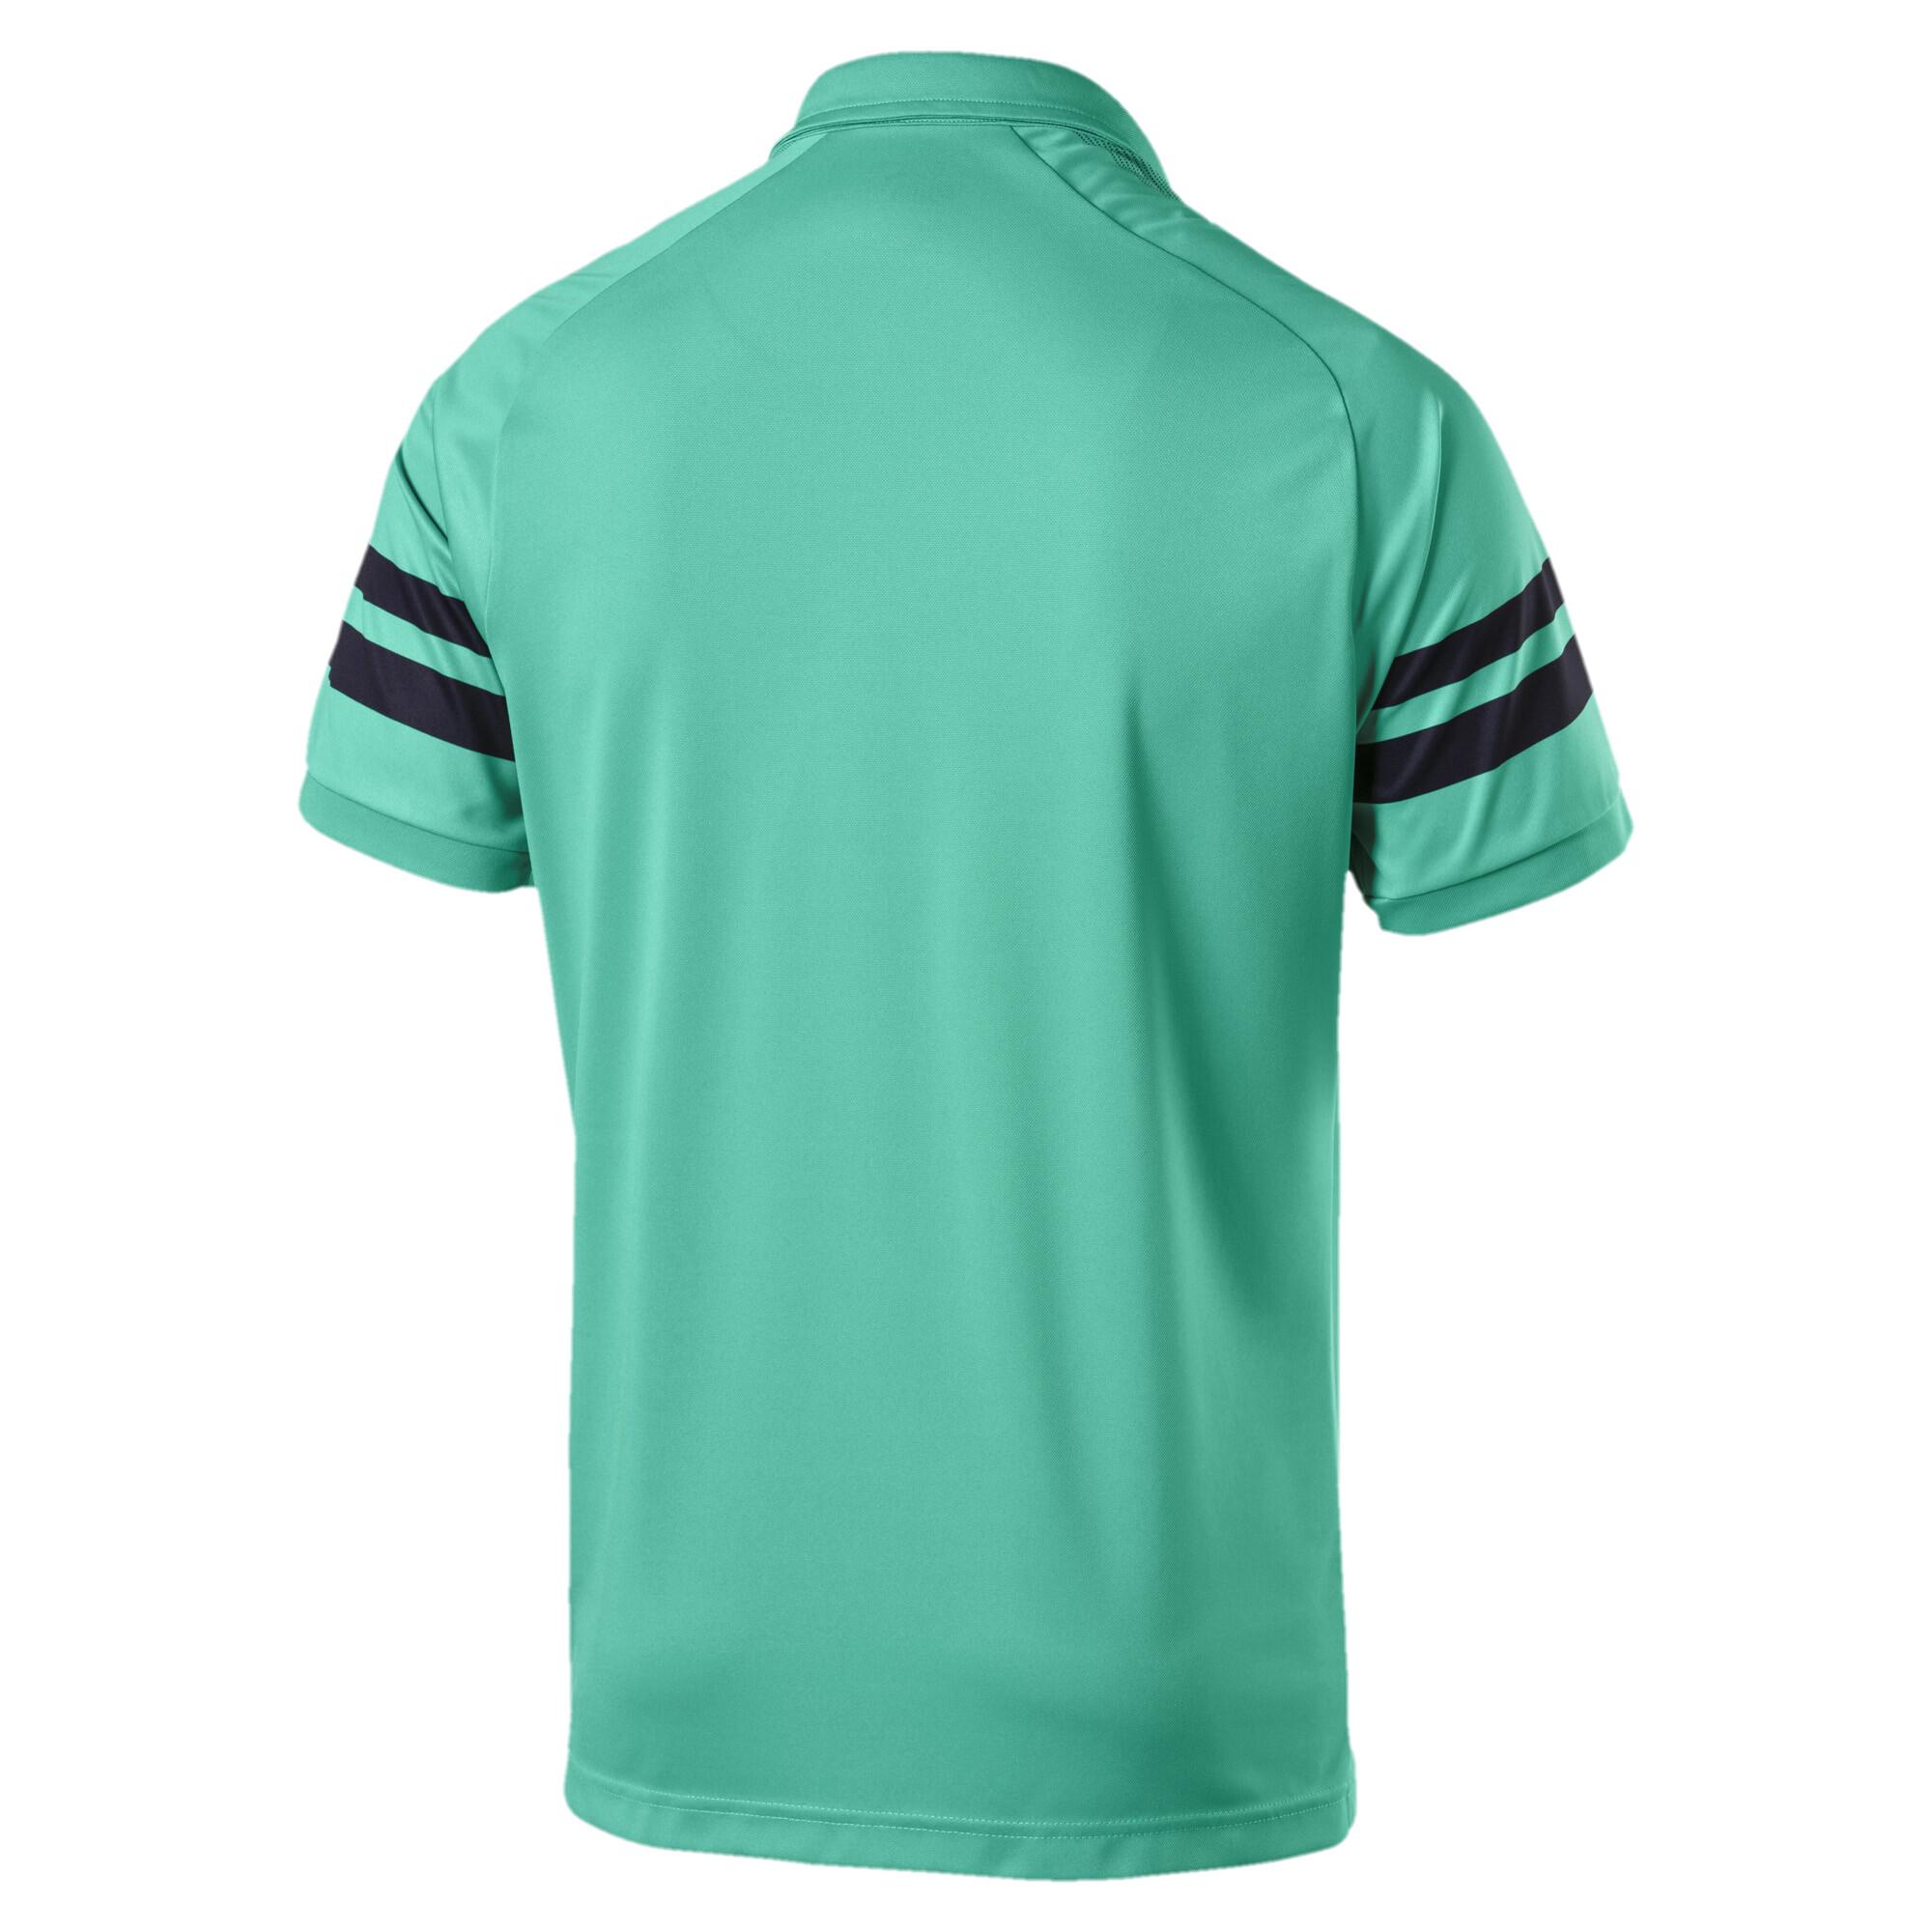 Camiseta de manga corta para hombres AFC Third